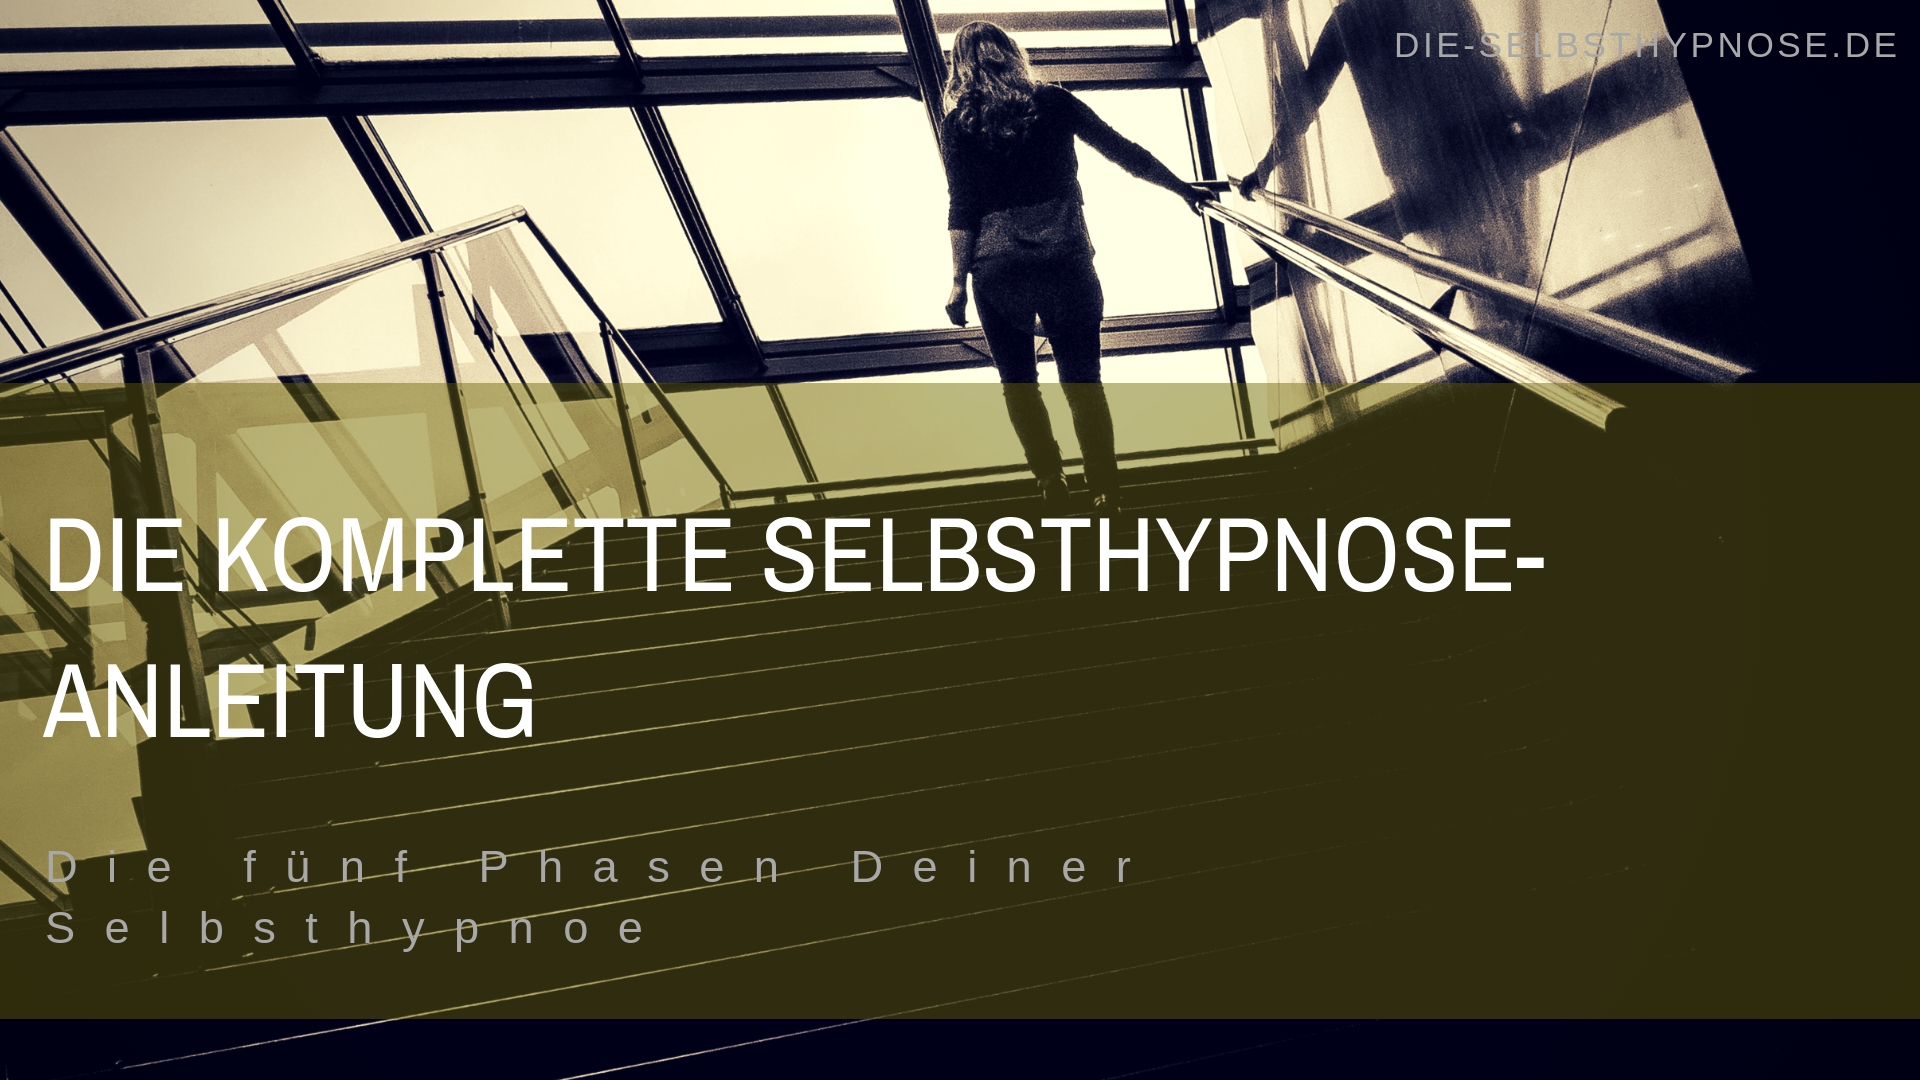 Die komplette Selbsthypnose-Anleitung